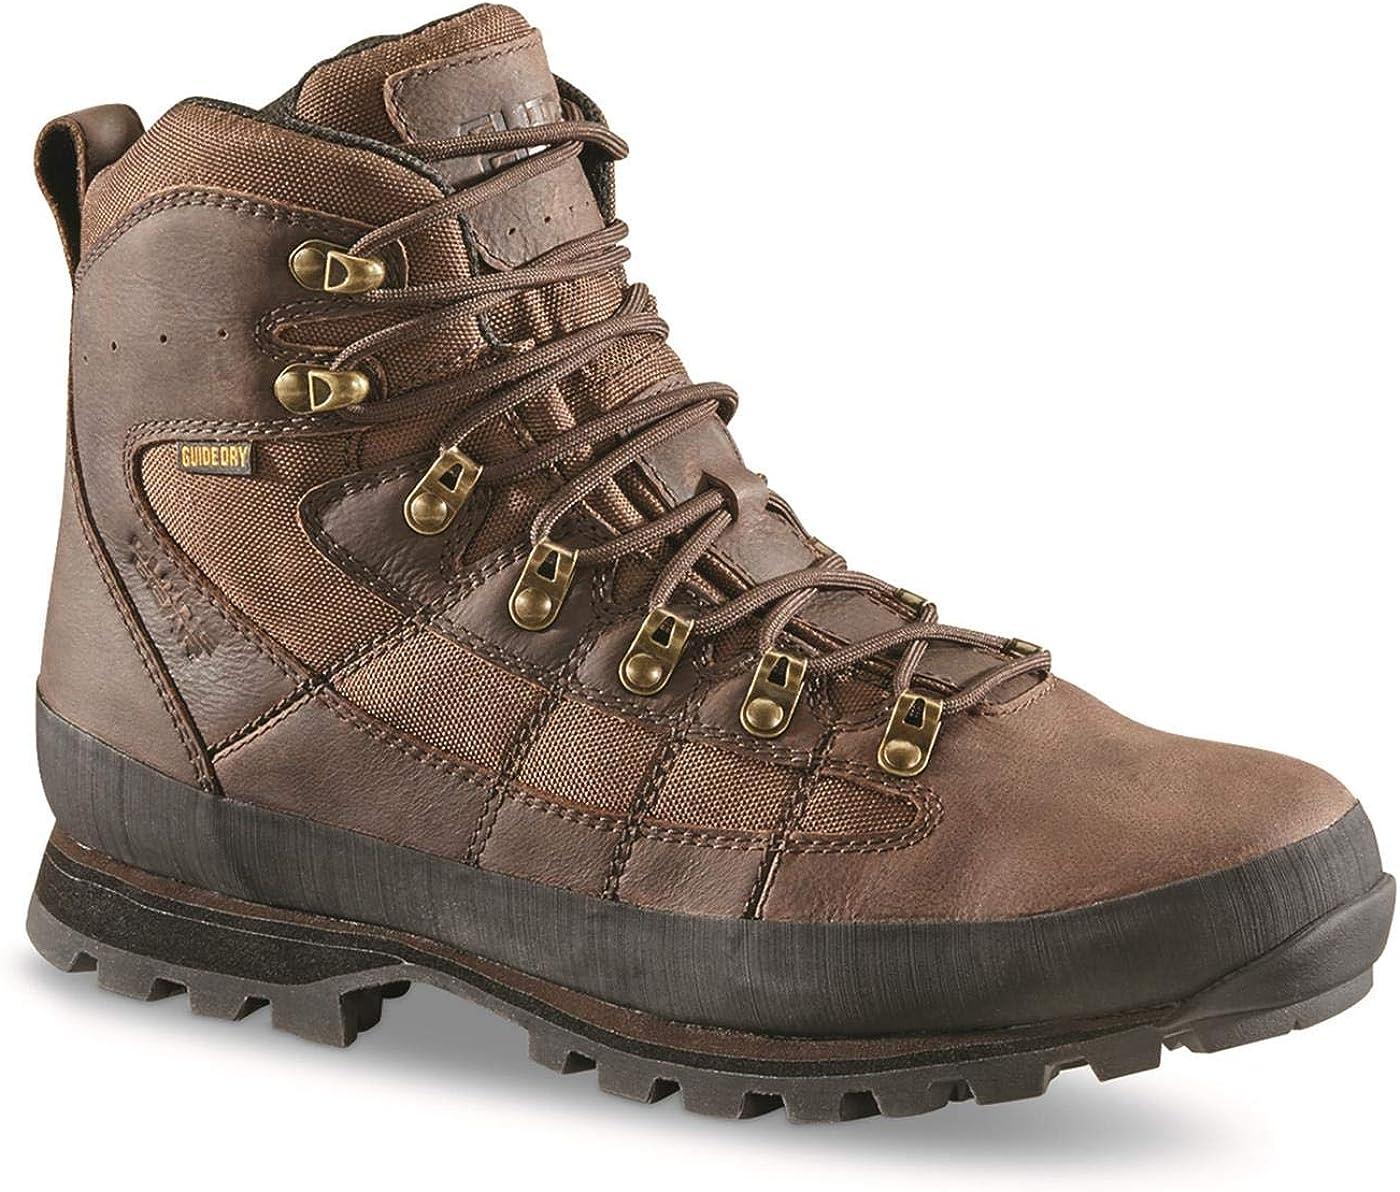 Guide Gear Men's Acadia II Waterproof Hiking Boot